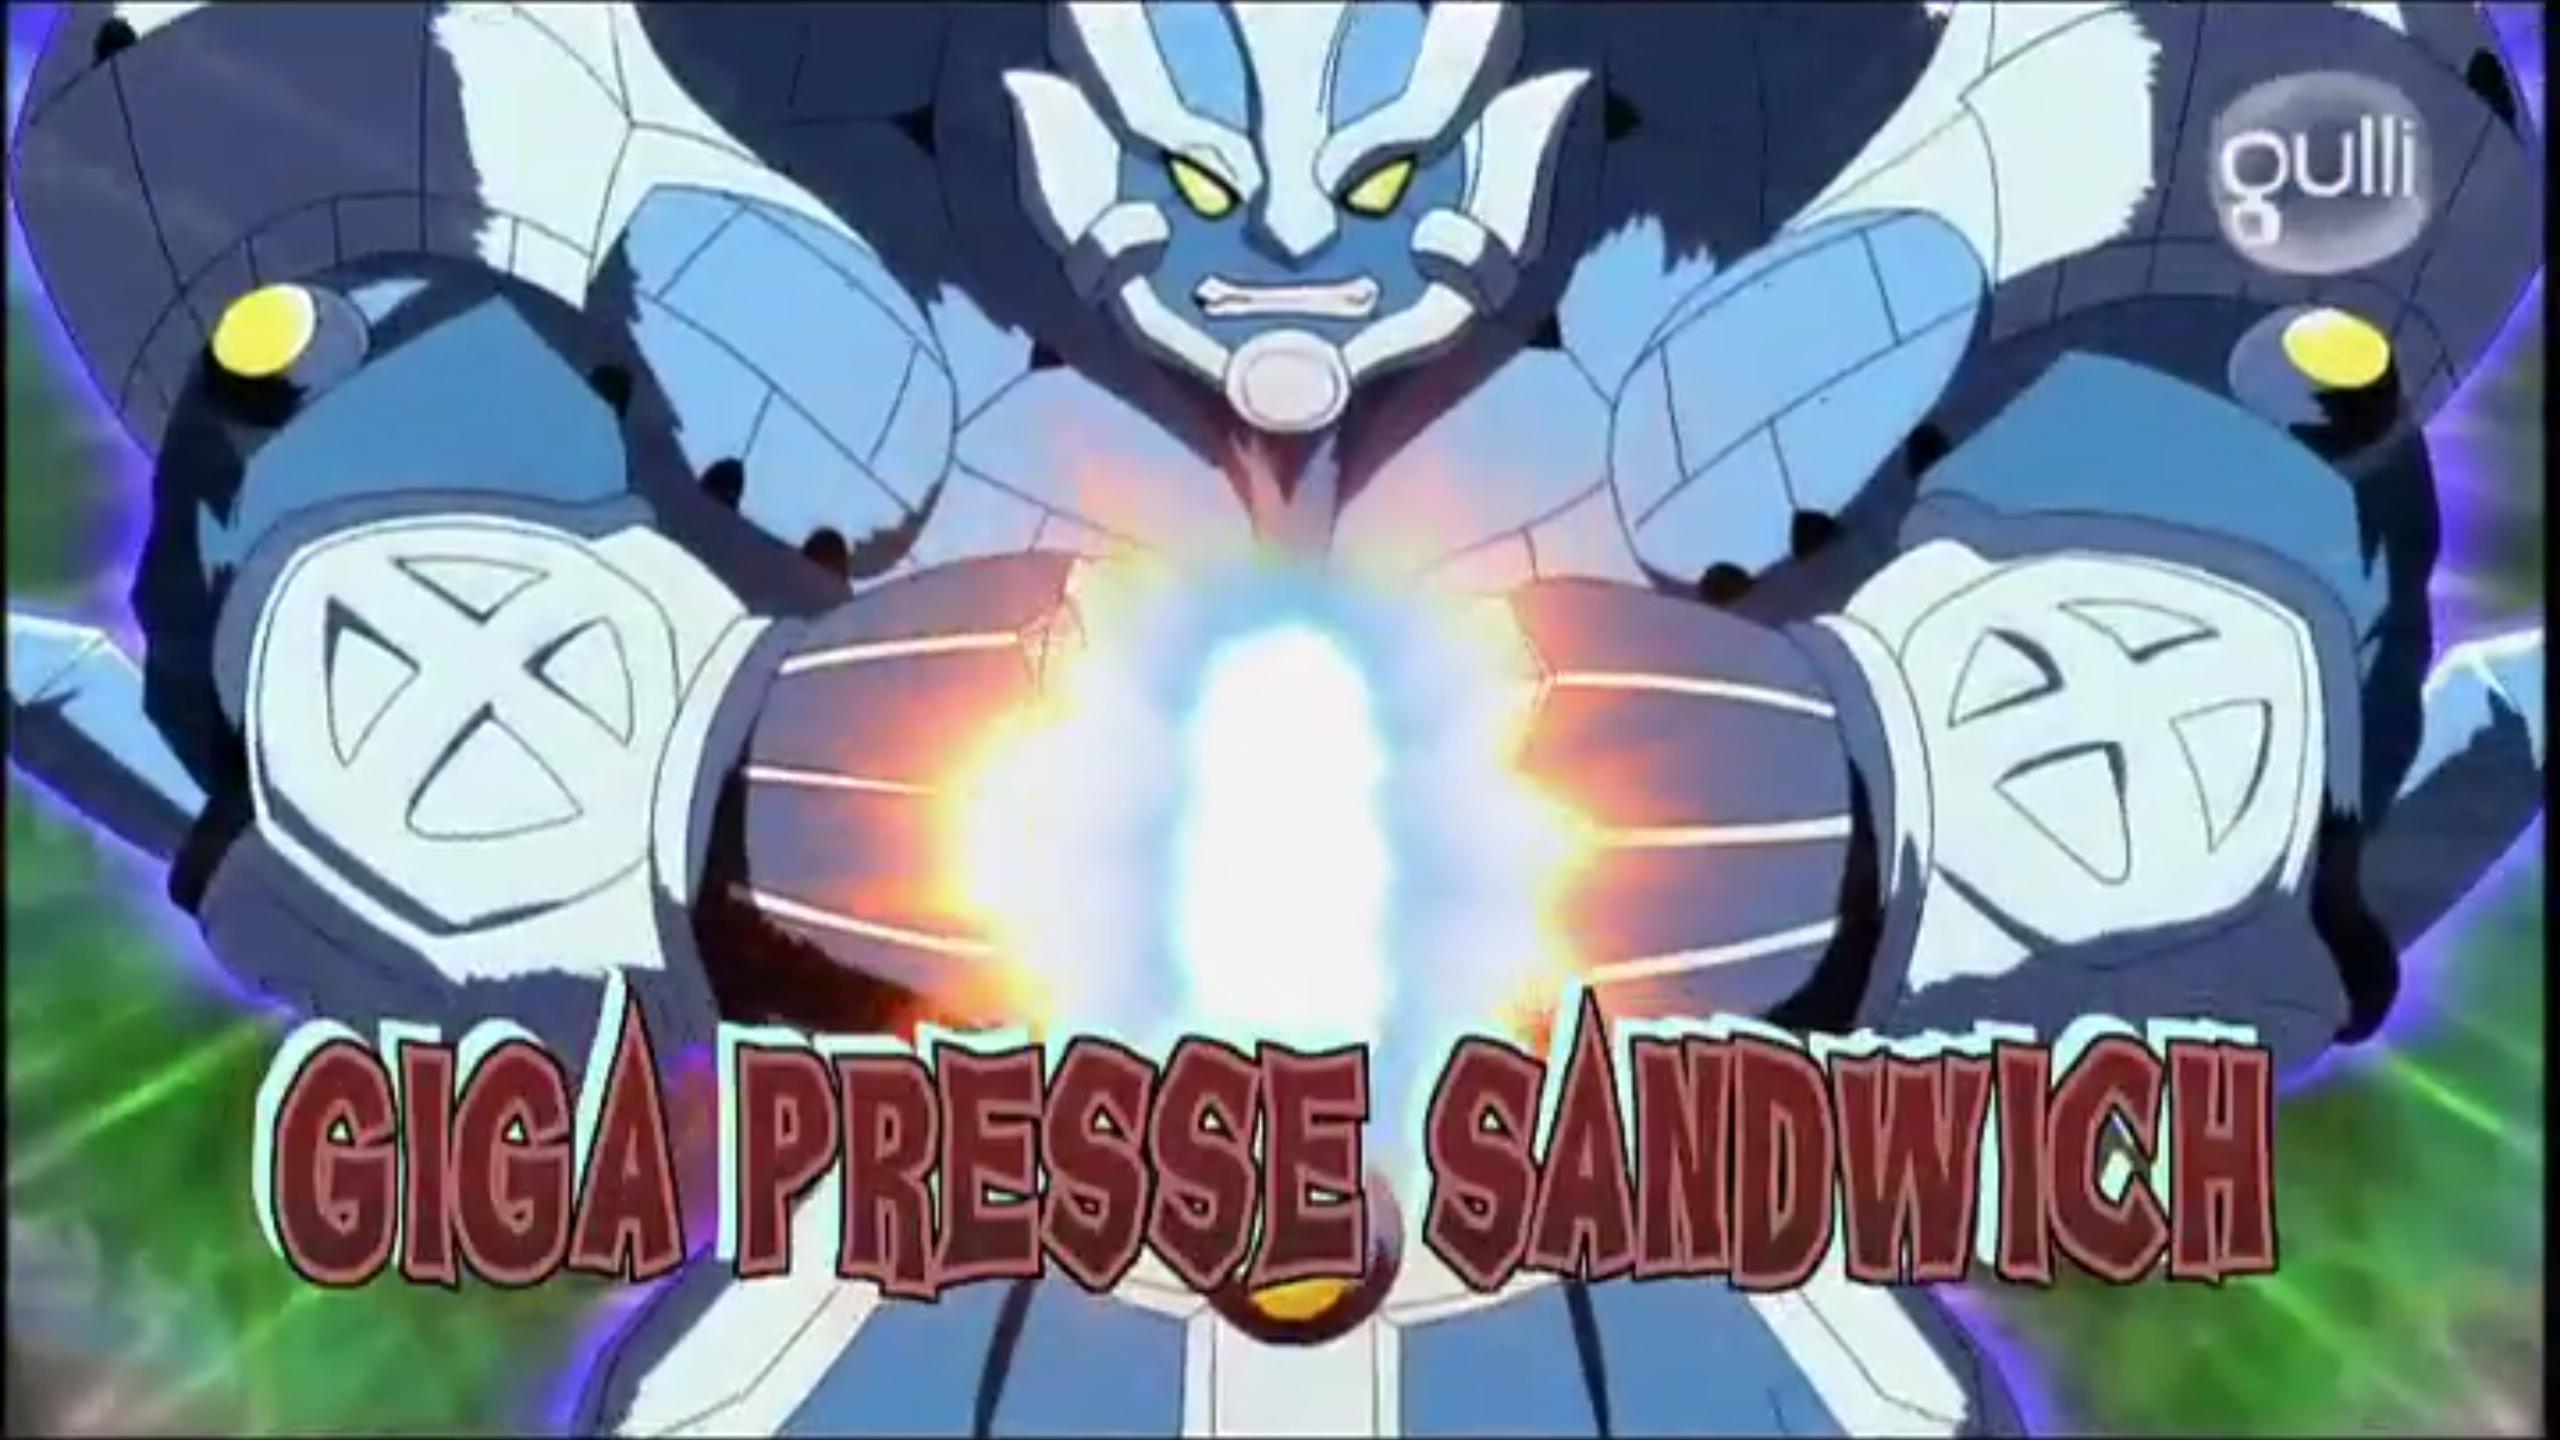 Giga Presse-Sandwich